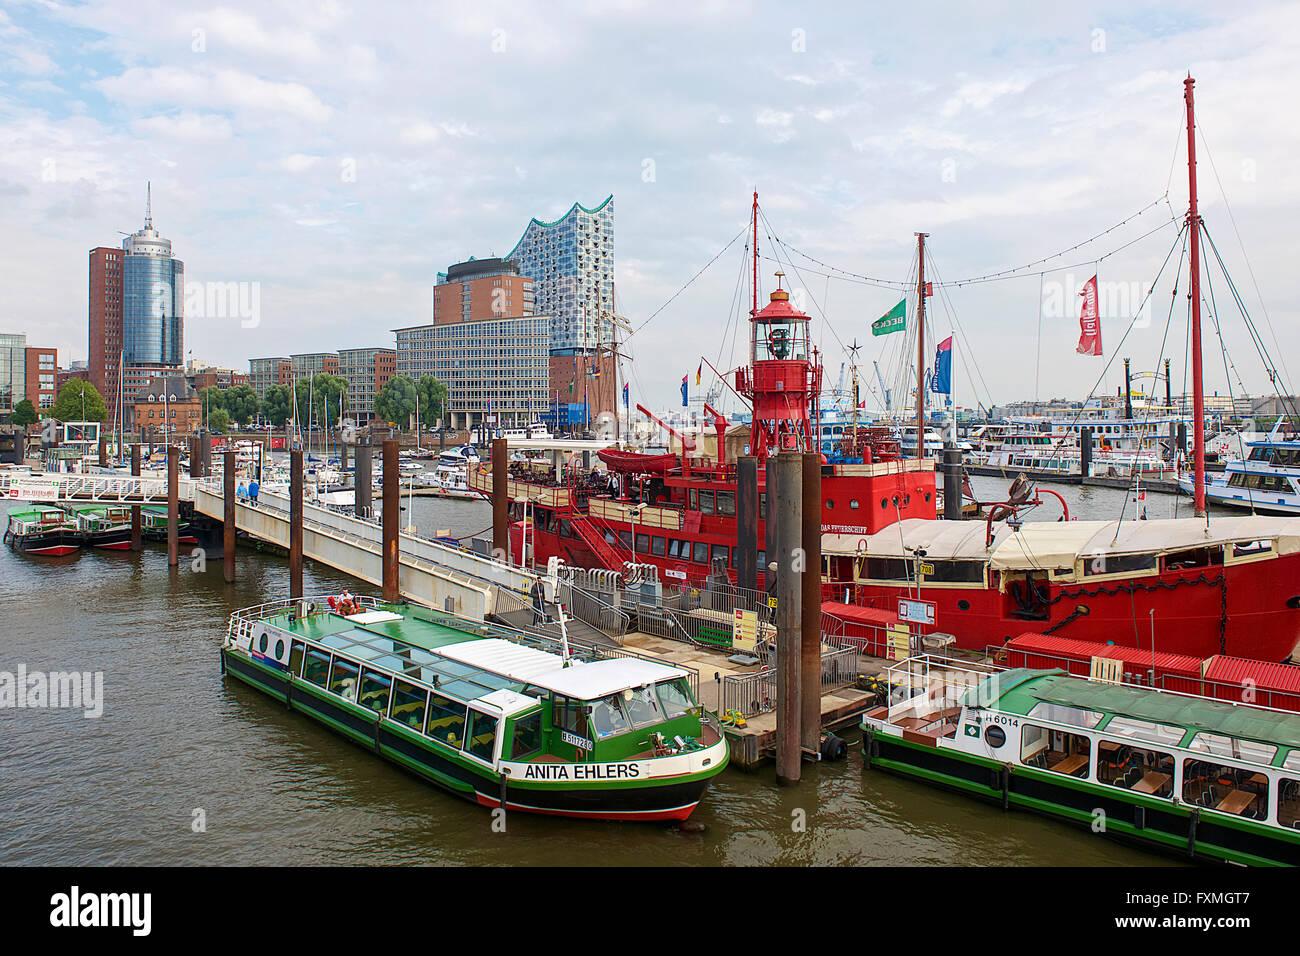 HafenCity, Hamburg, Germany - Stock Image